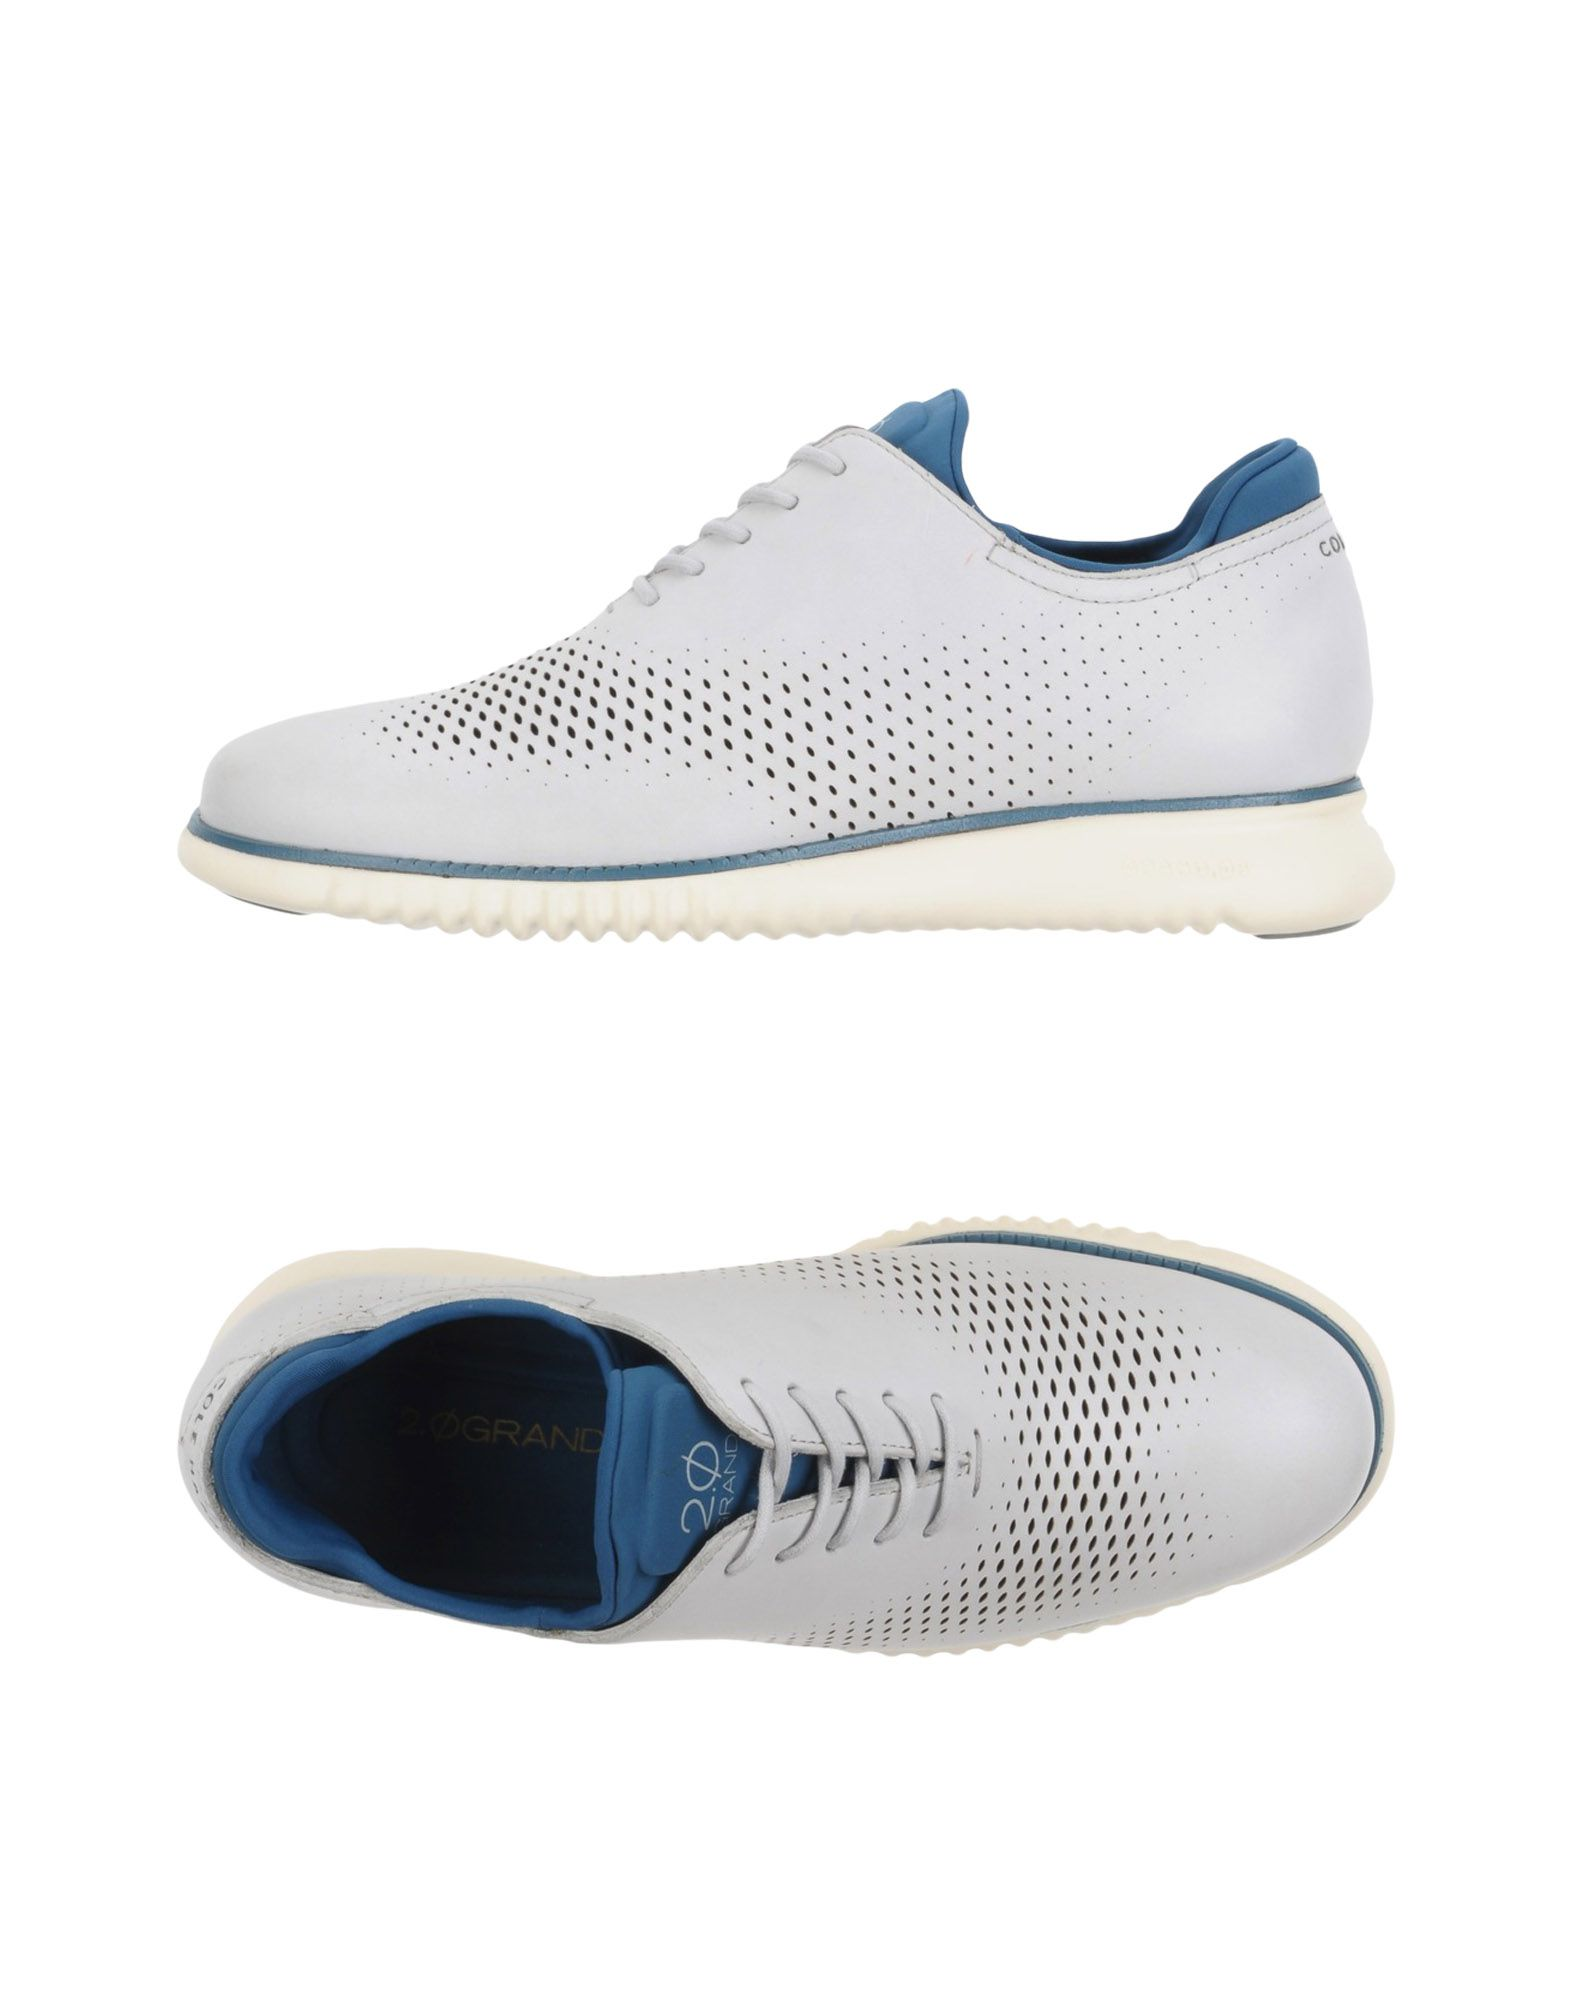 Cole 11302042XP Haan Sneakers Herren  11302042XP Cole faf40a